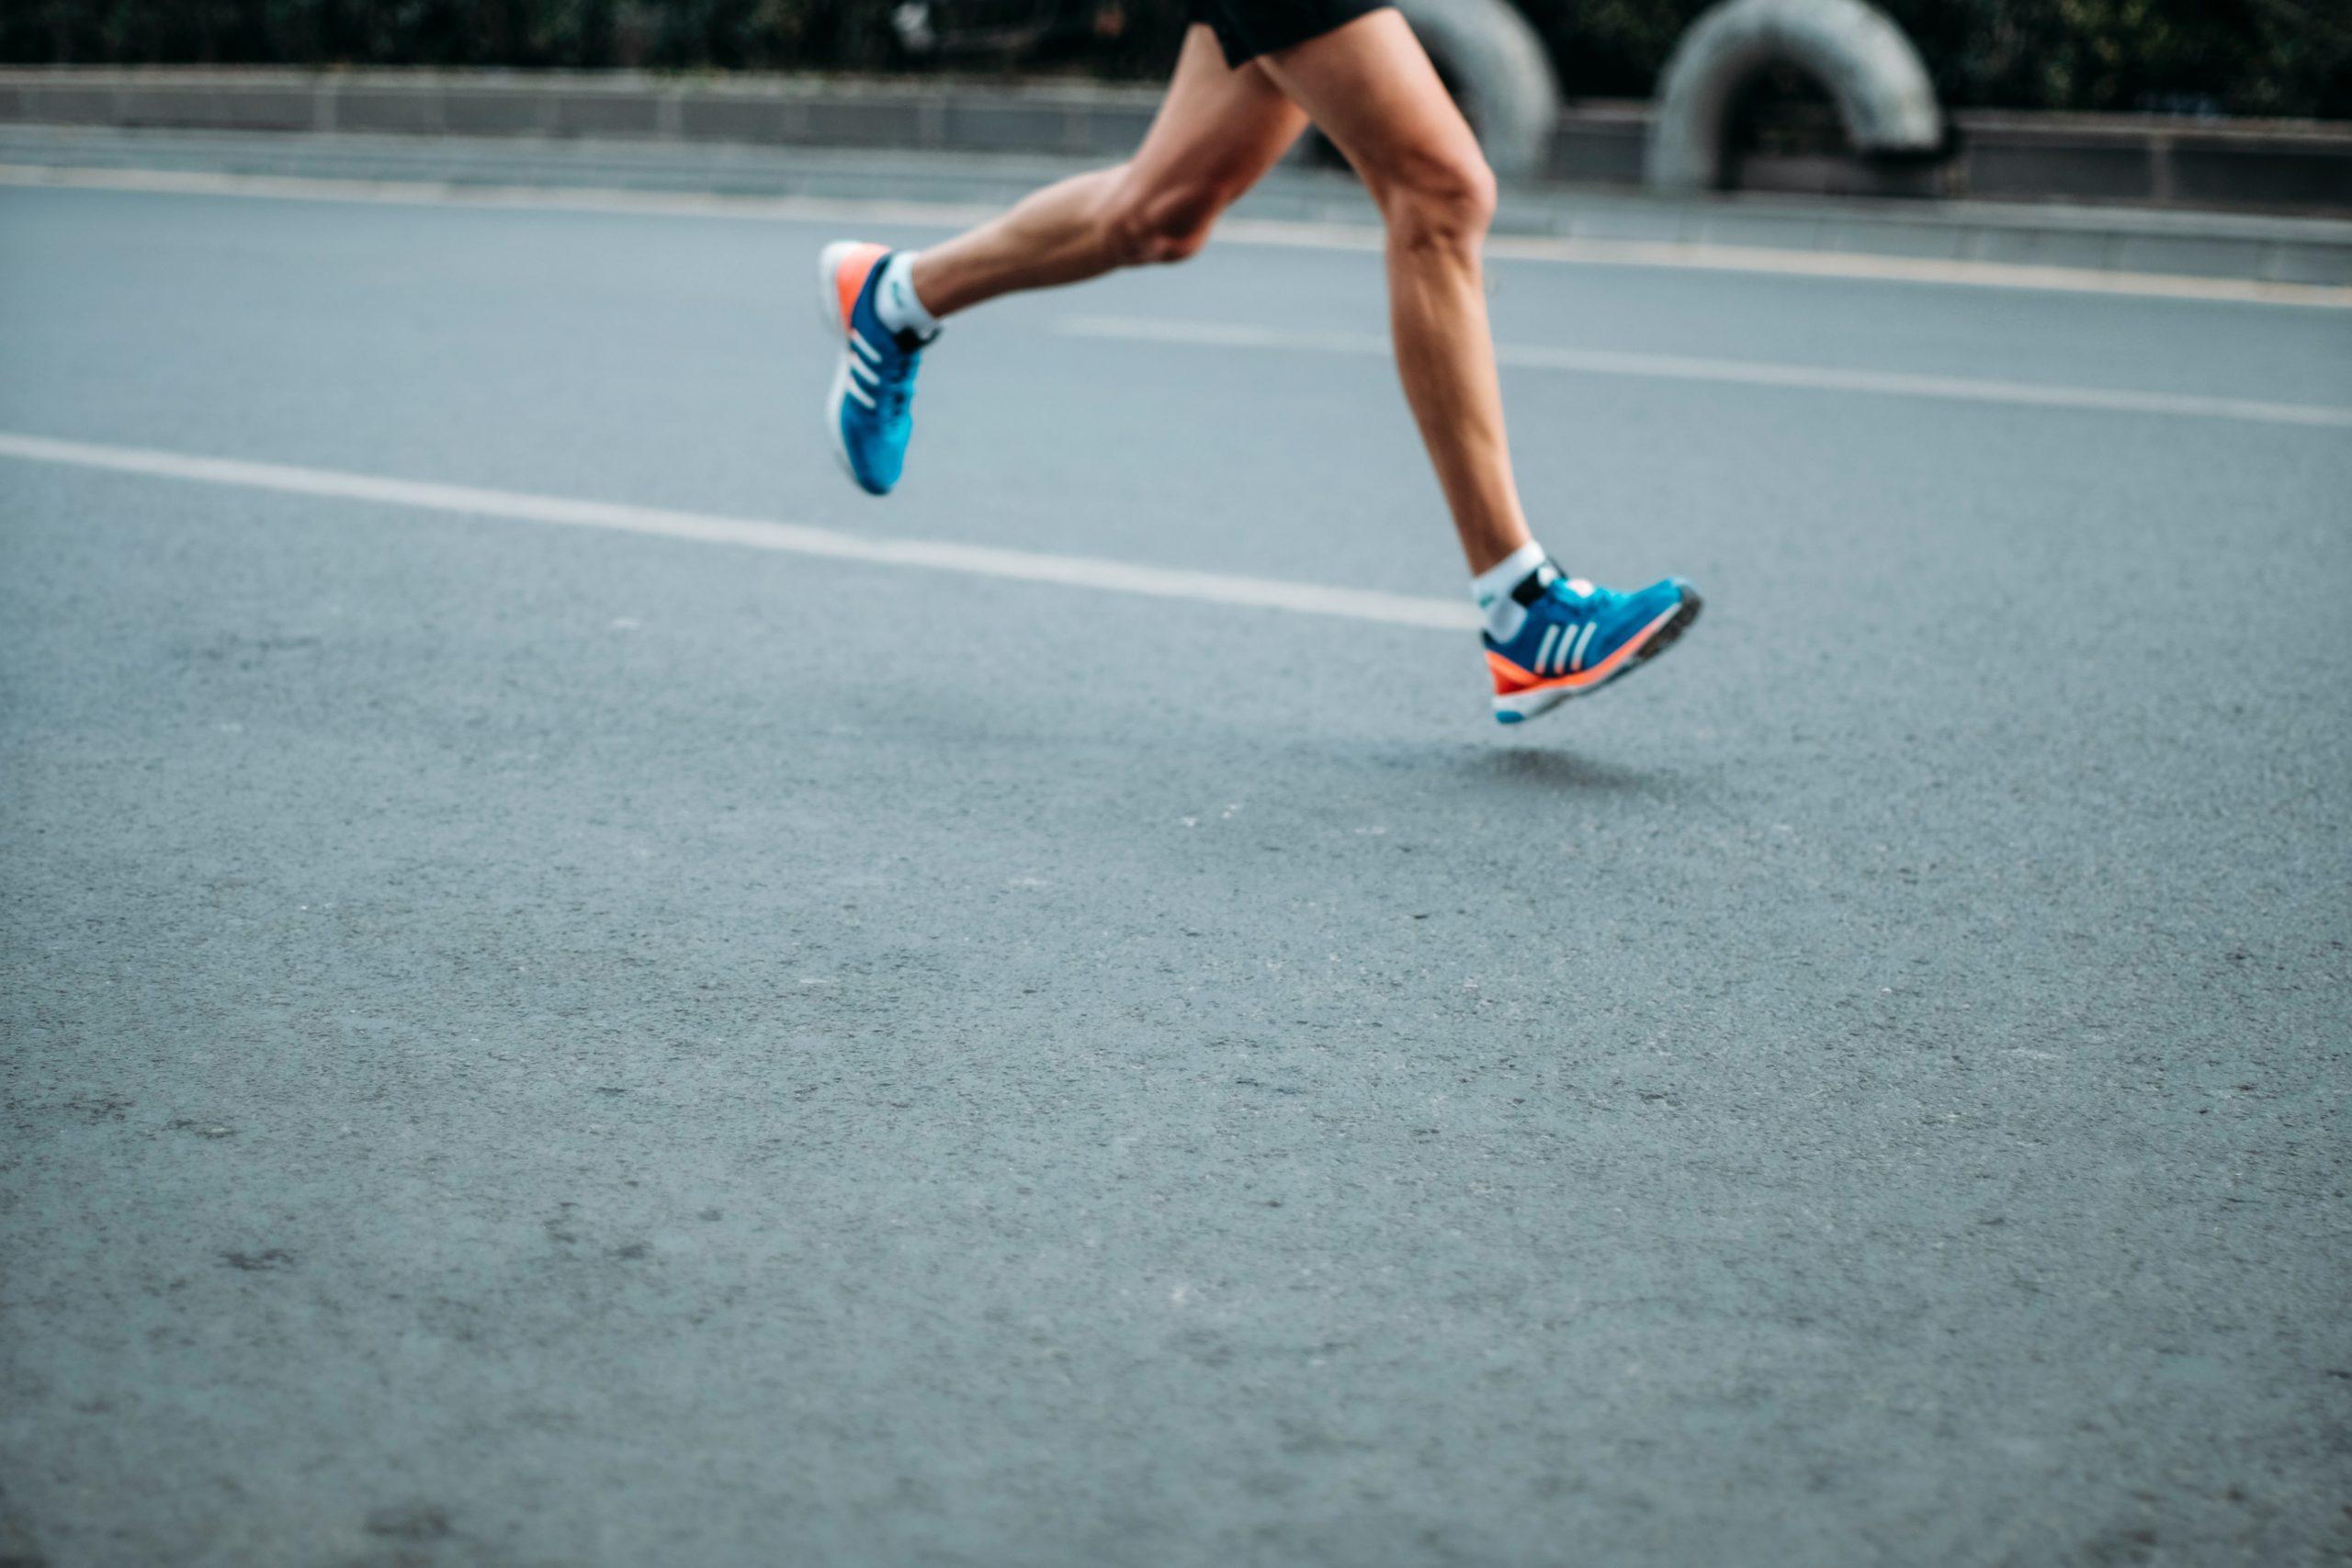 løpe 30 minutter